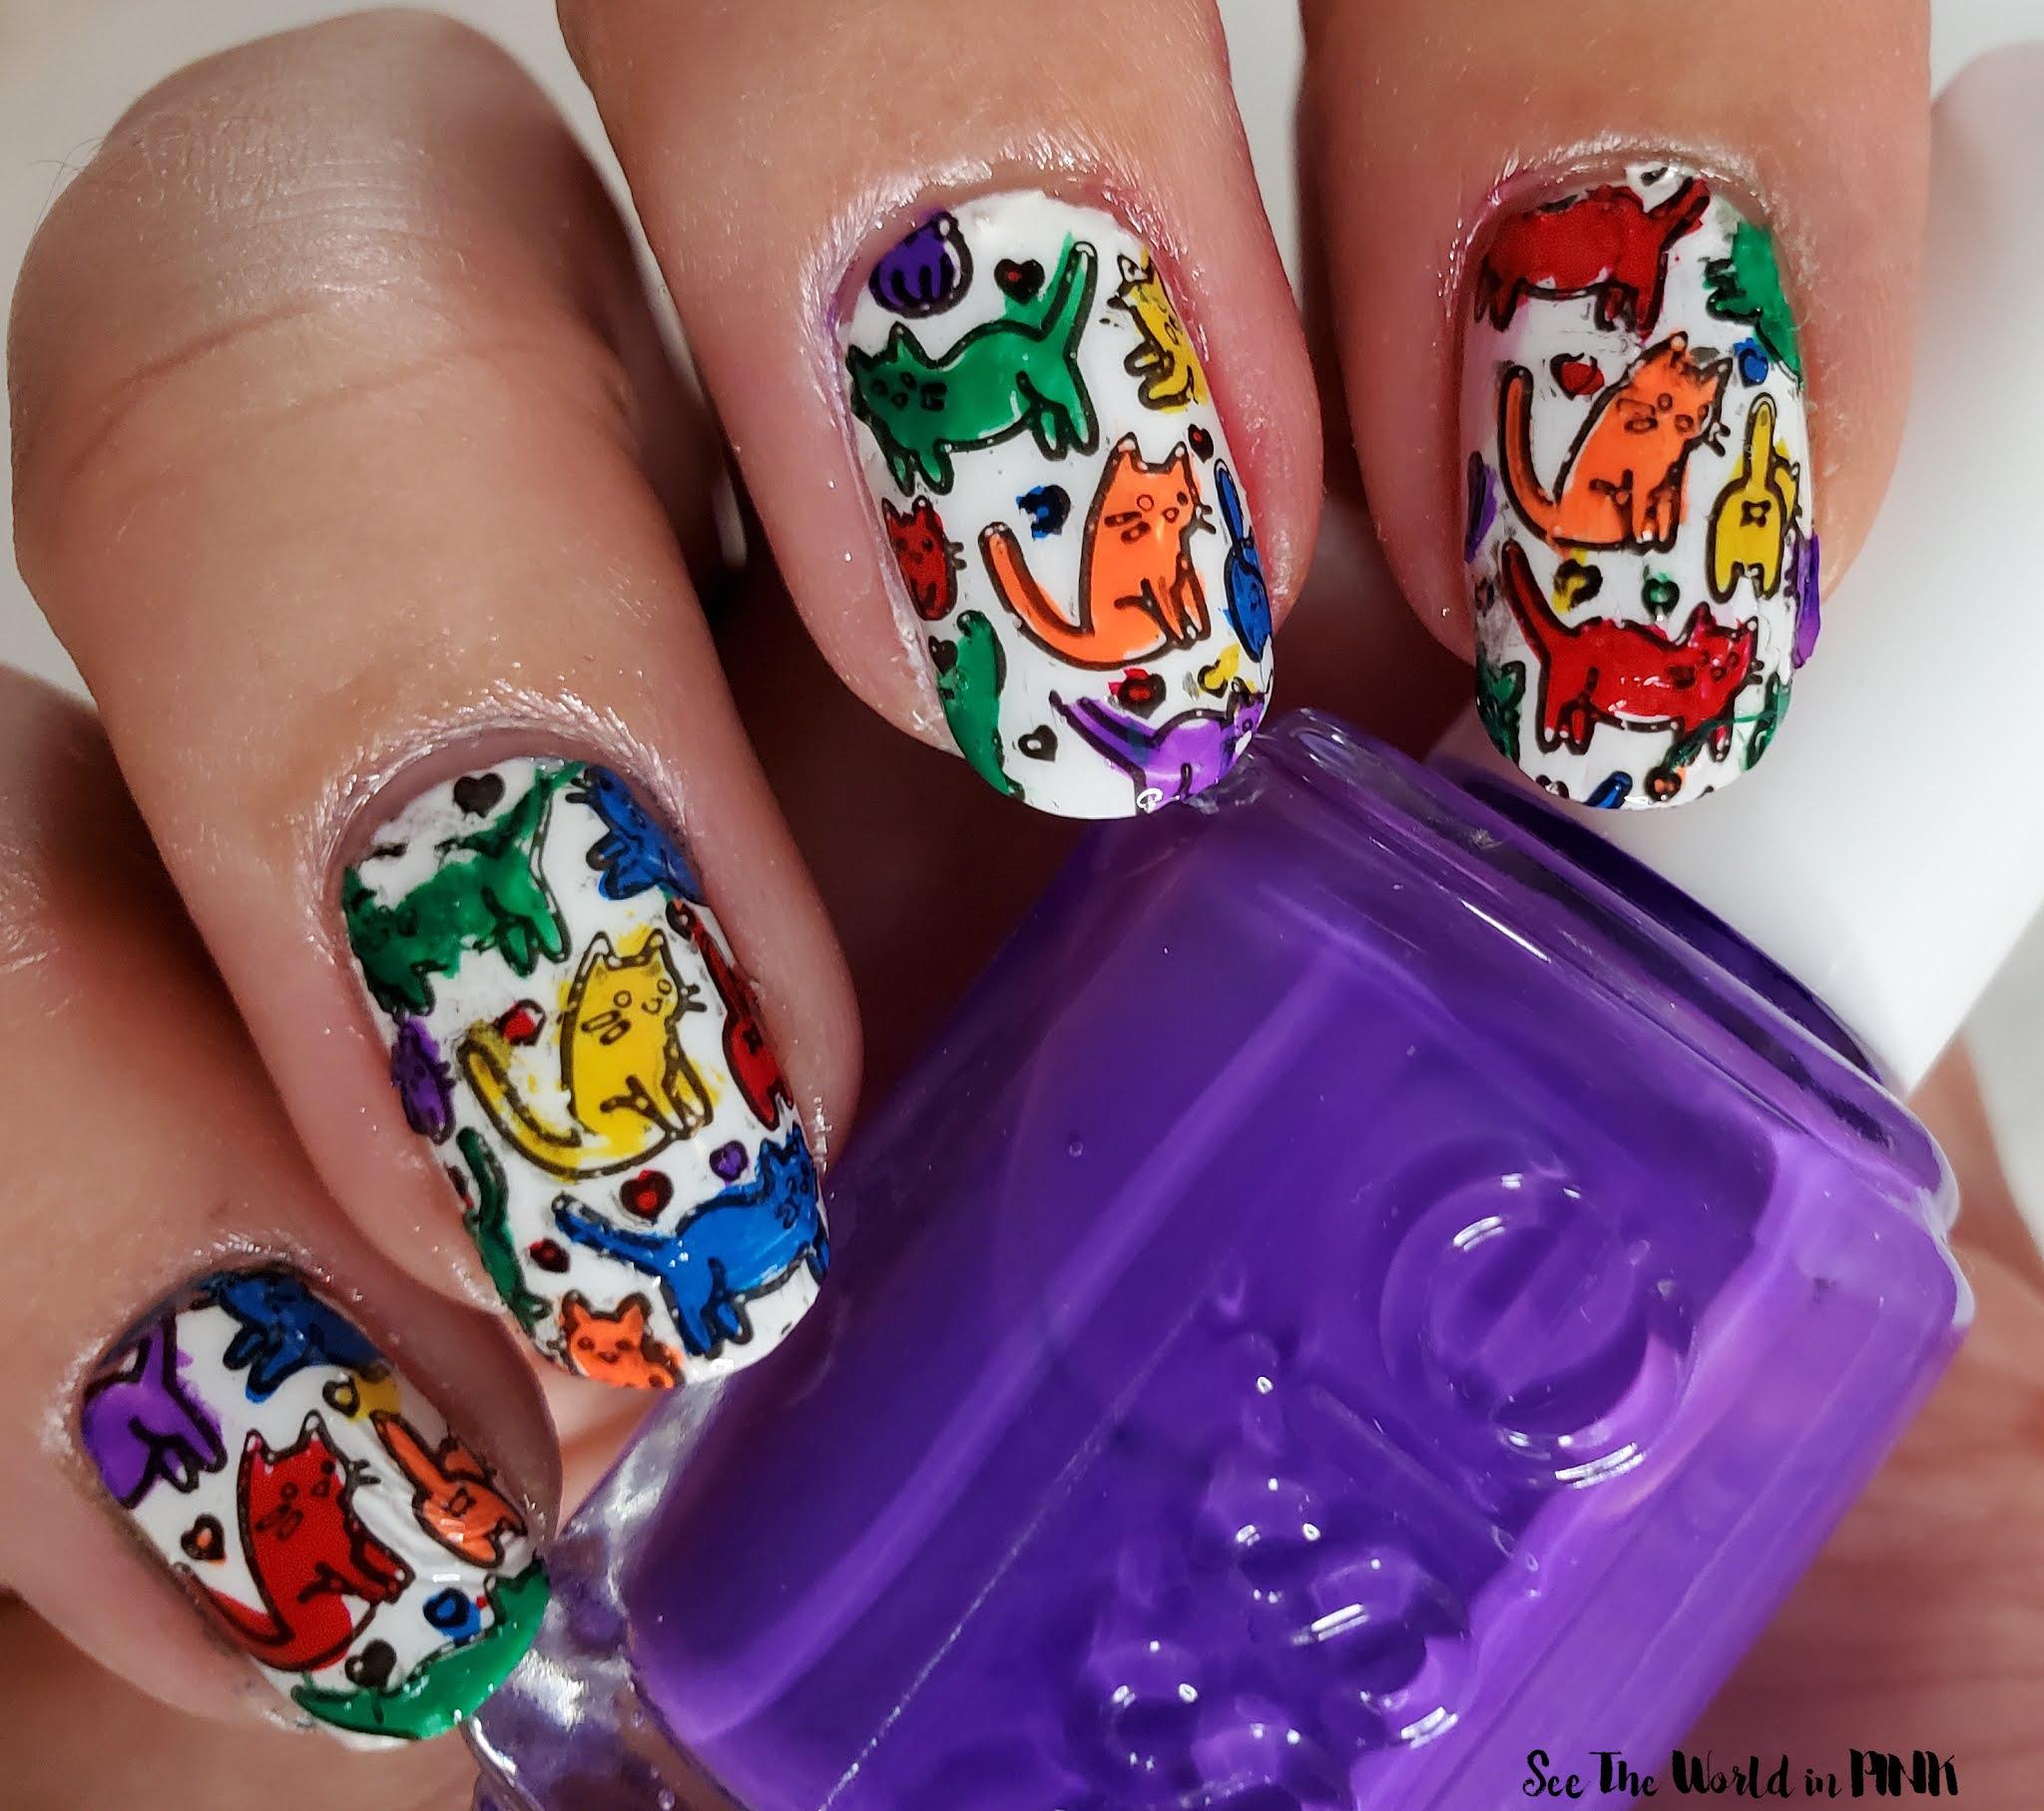 Manicure Monday - Pride Rainbow Kitten Nails